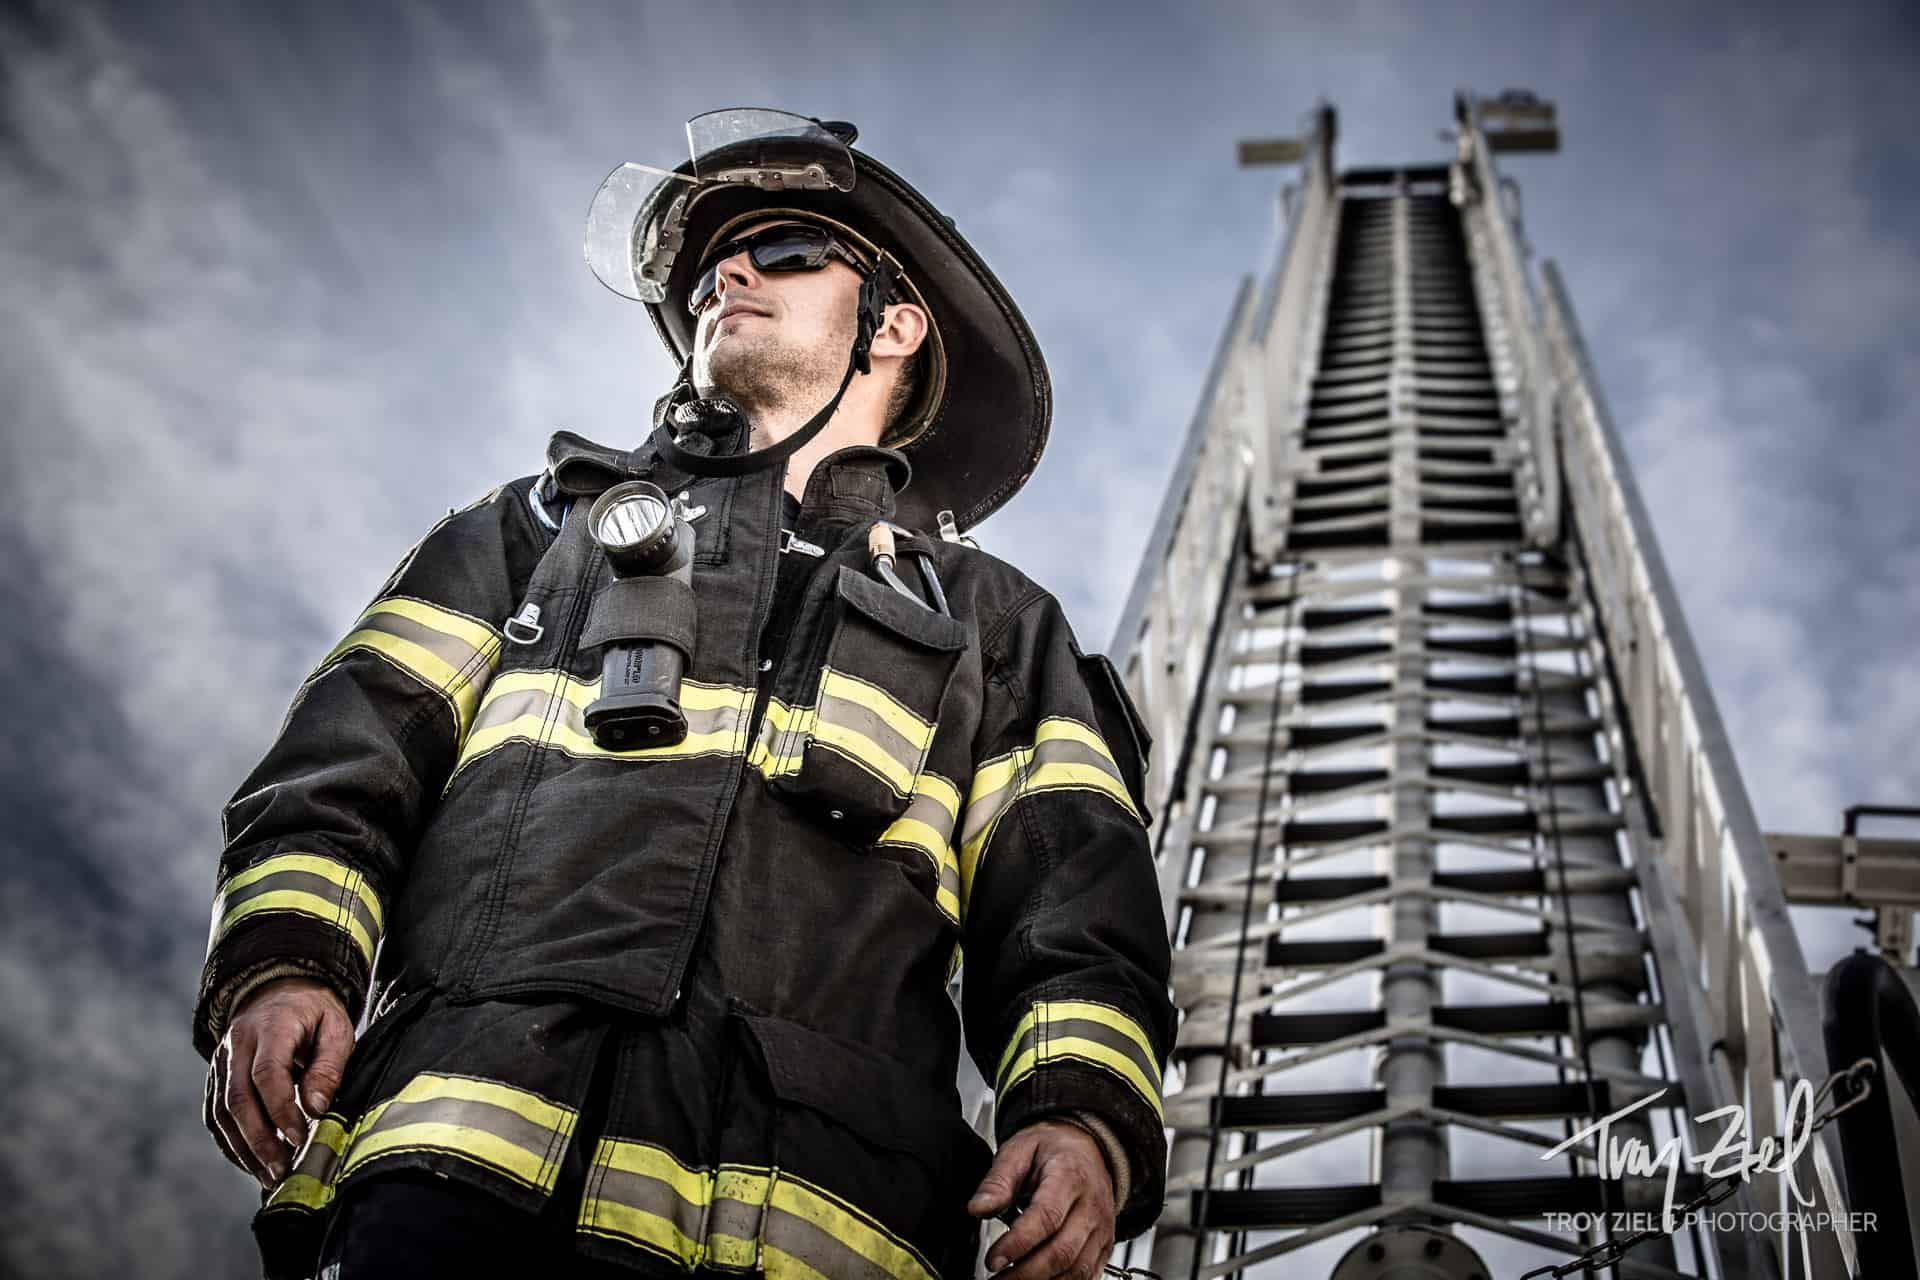 Firefighter_JimmySinkay_byTroyZiel-0039